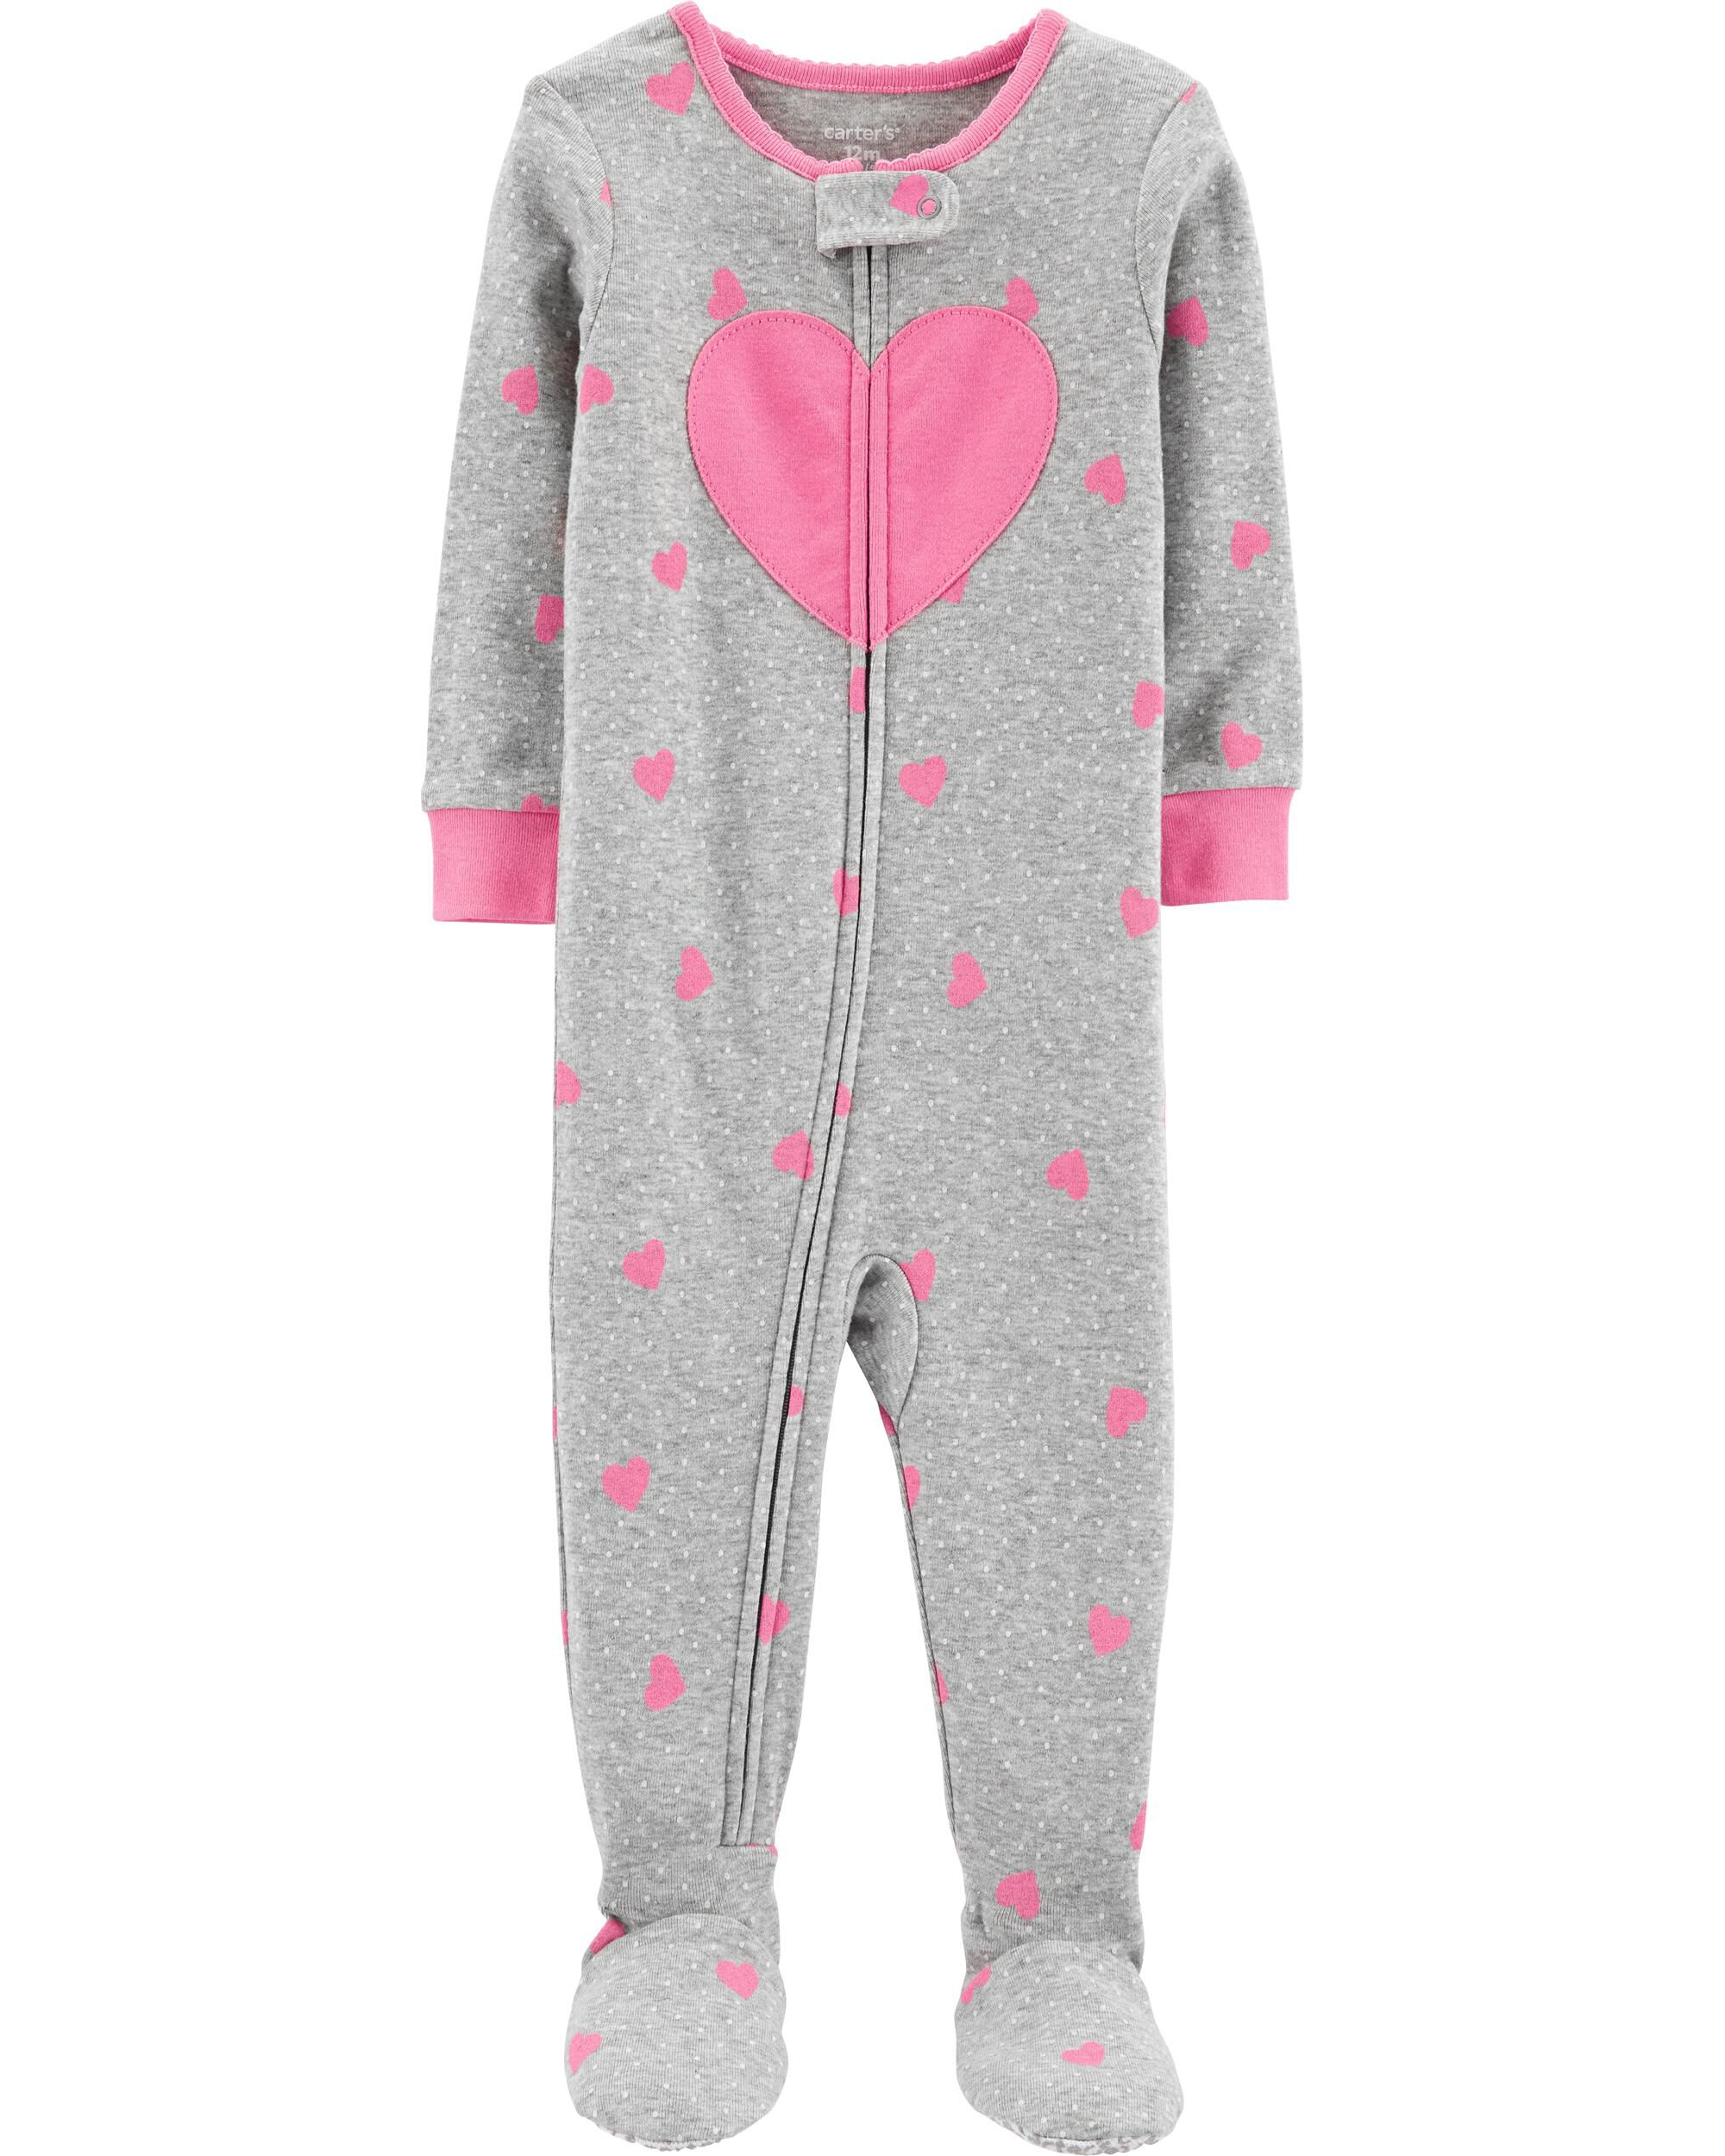 1-Piece Heart Snug Fit Cotton Footie PJs